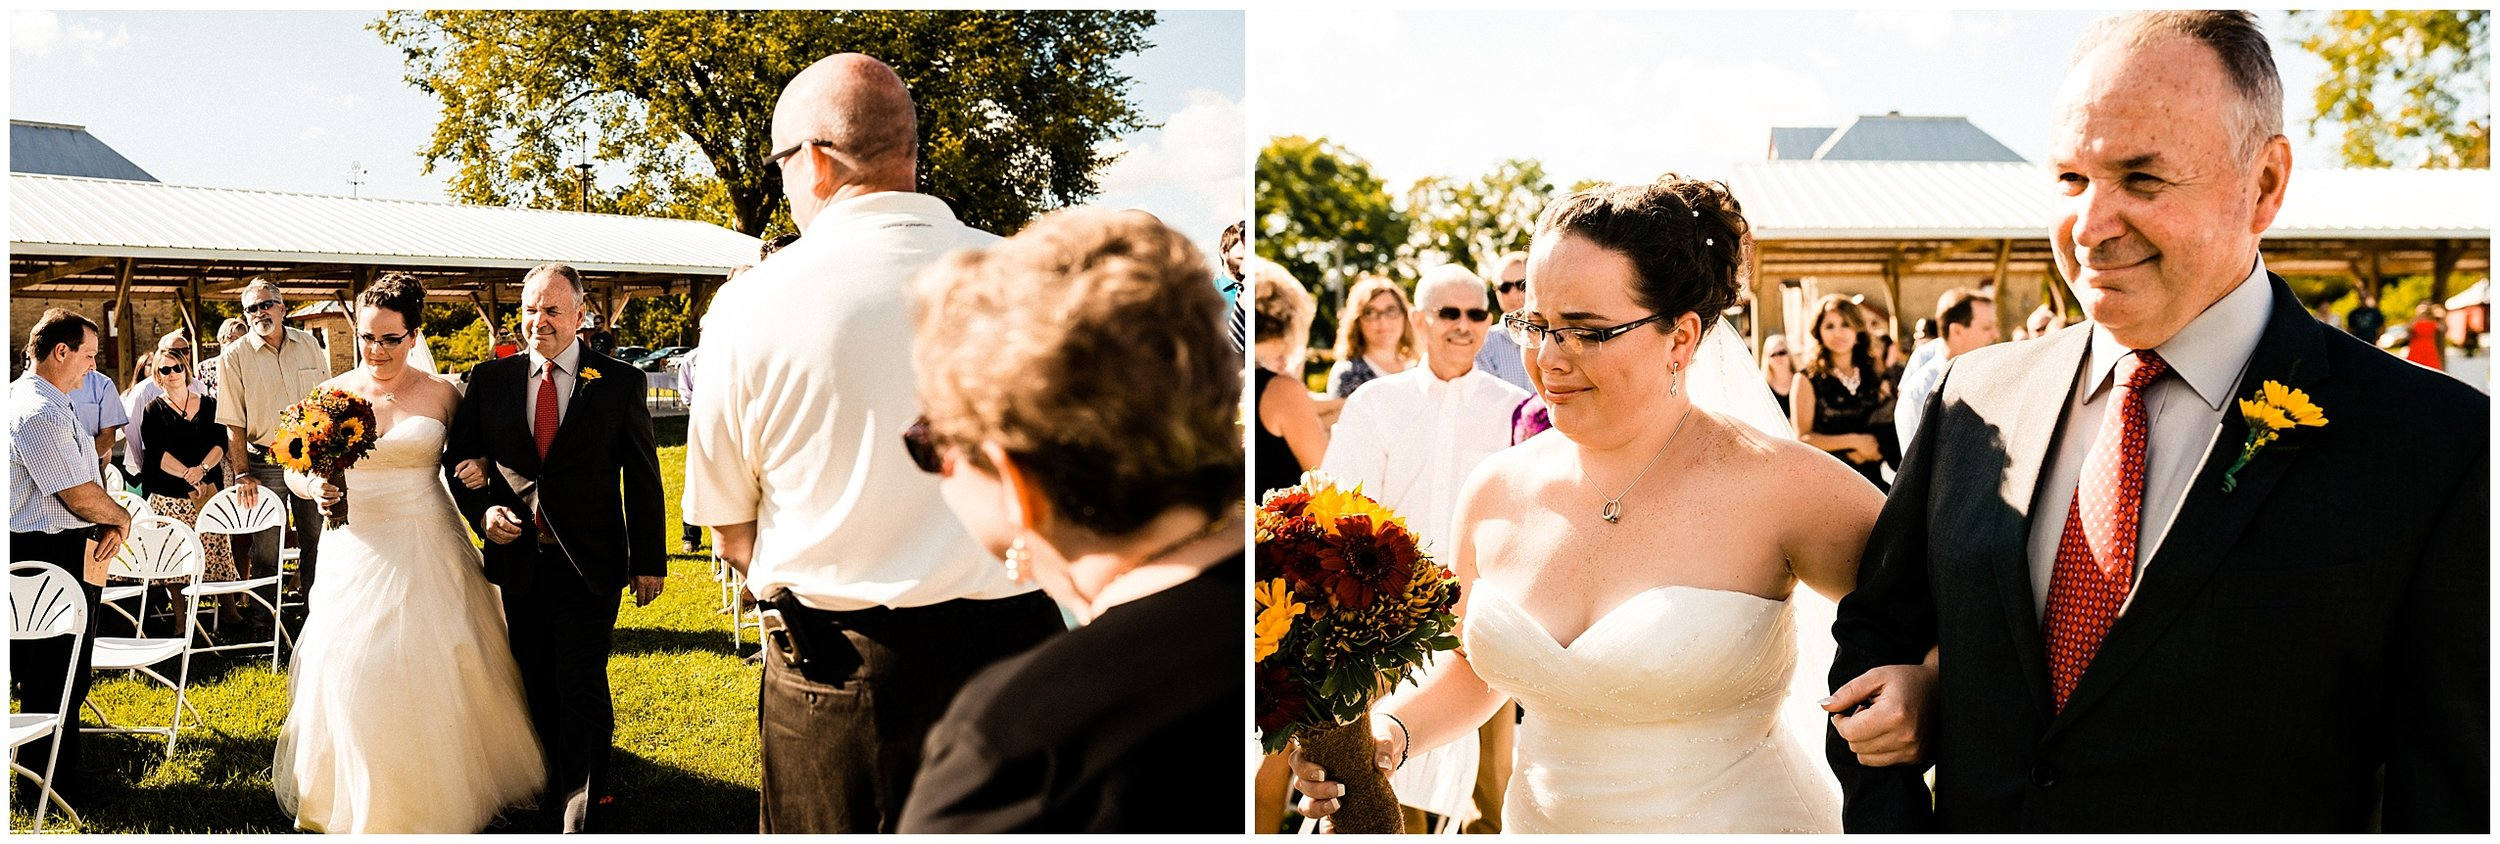 Micheal + Chelsie   Just Married #kyleepaigephotography_1570.jpg